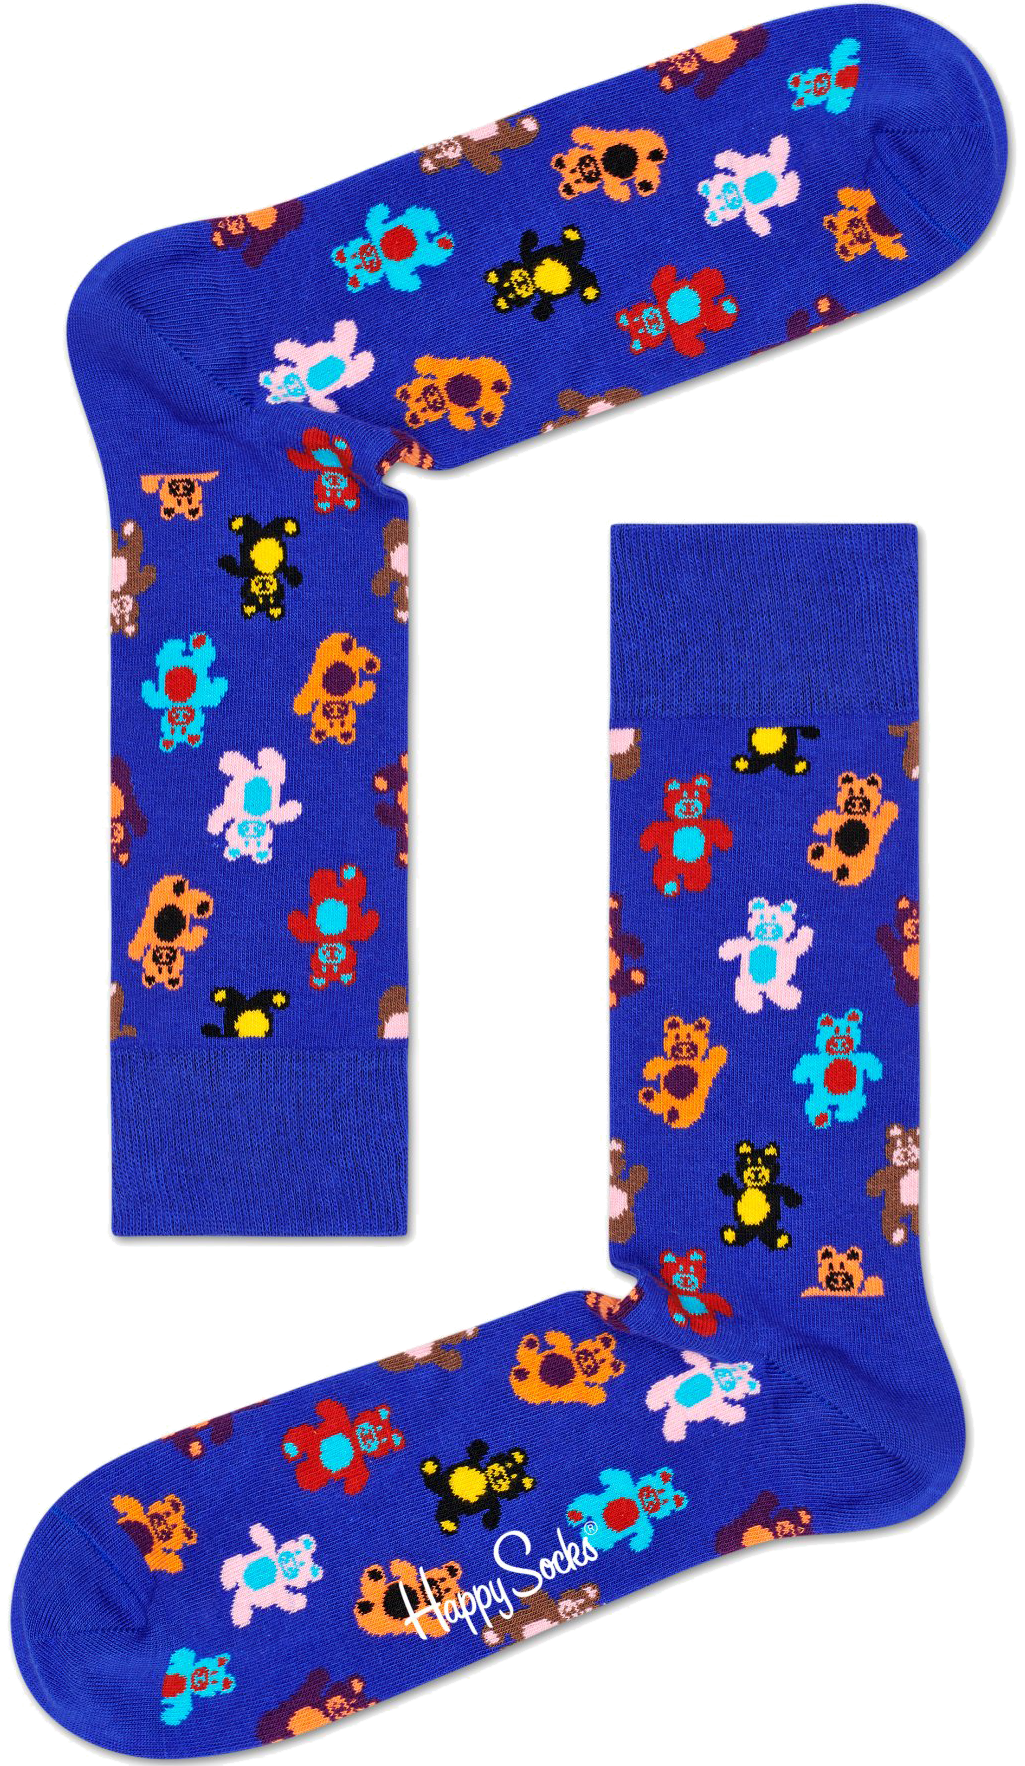 Blaue HAPPY SOCKS Socken TEDDYBEAR Ys4Jd